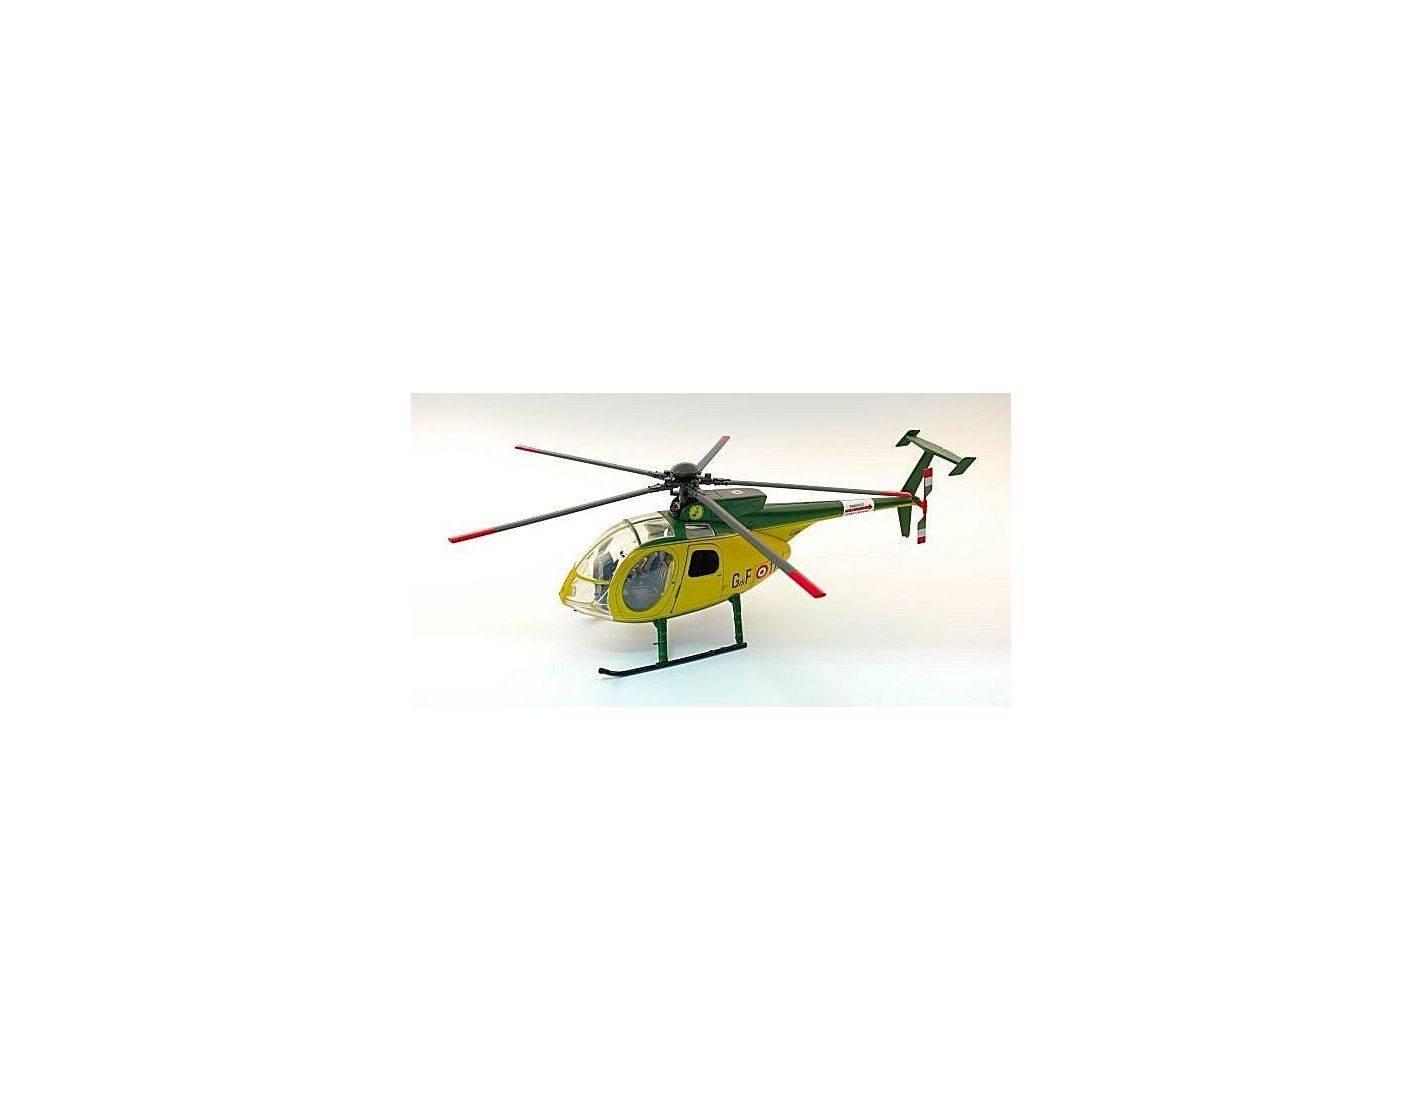 Elicottero Nh500 : New ray ny elicottero nh guardia di finanza